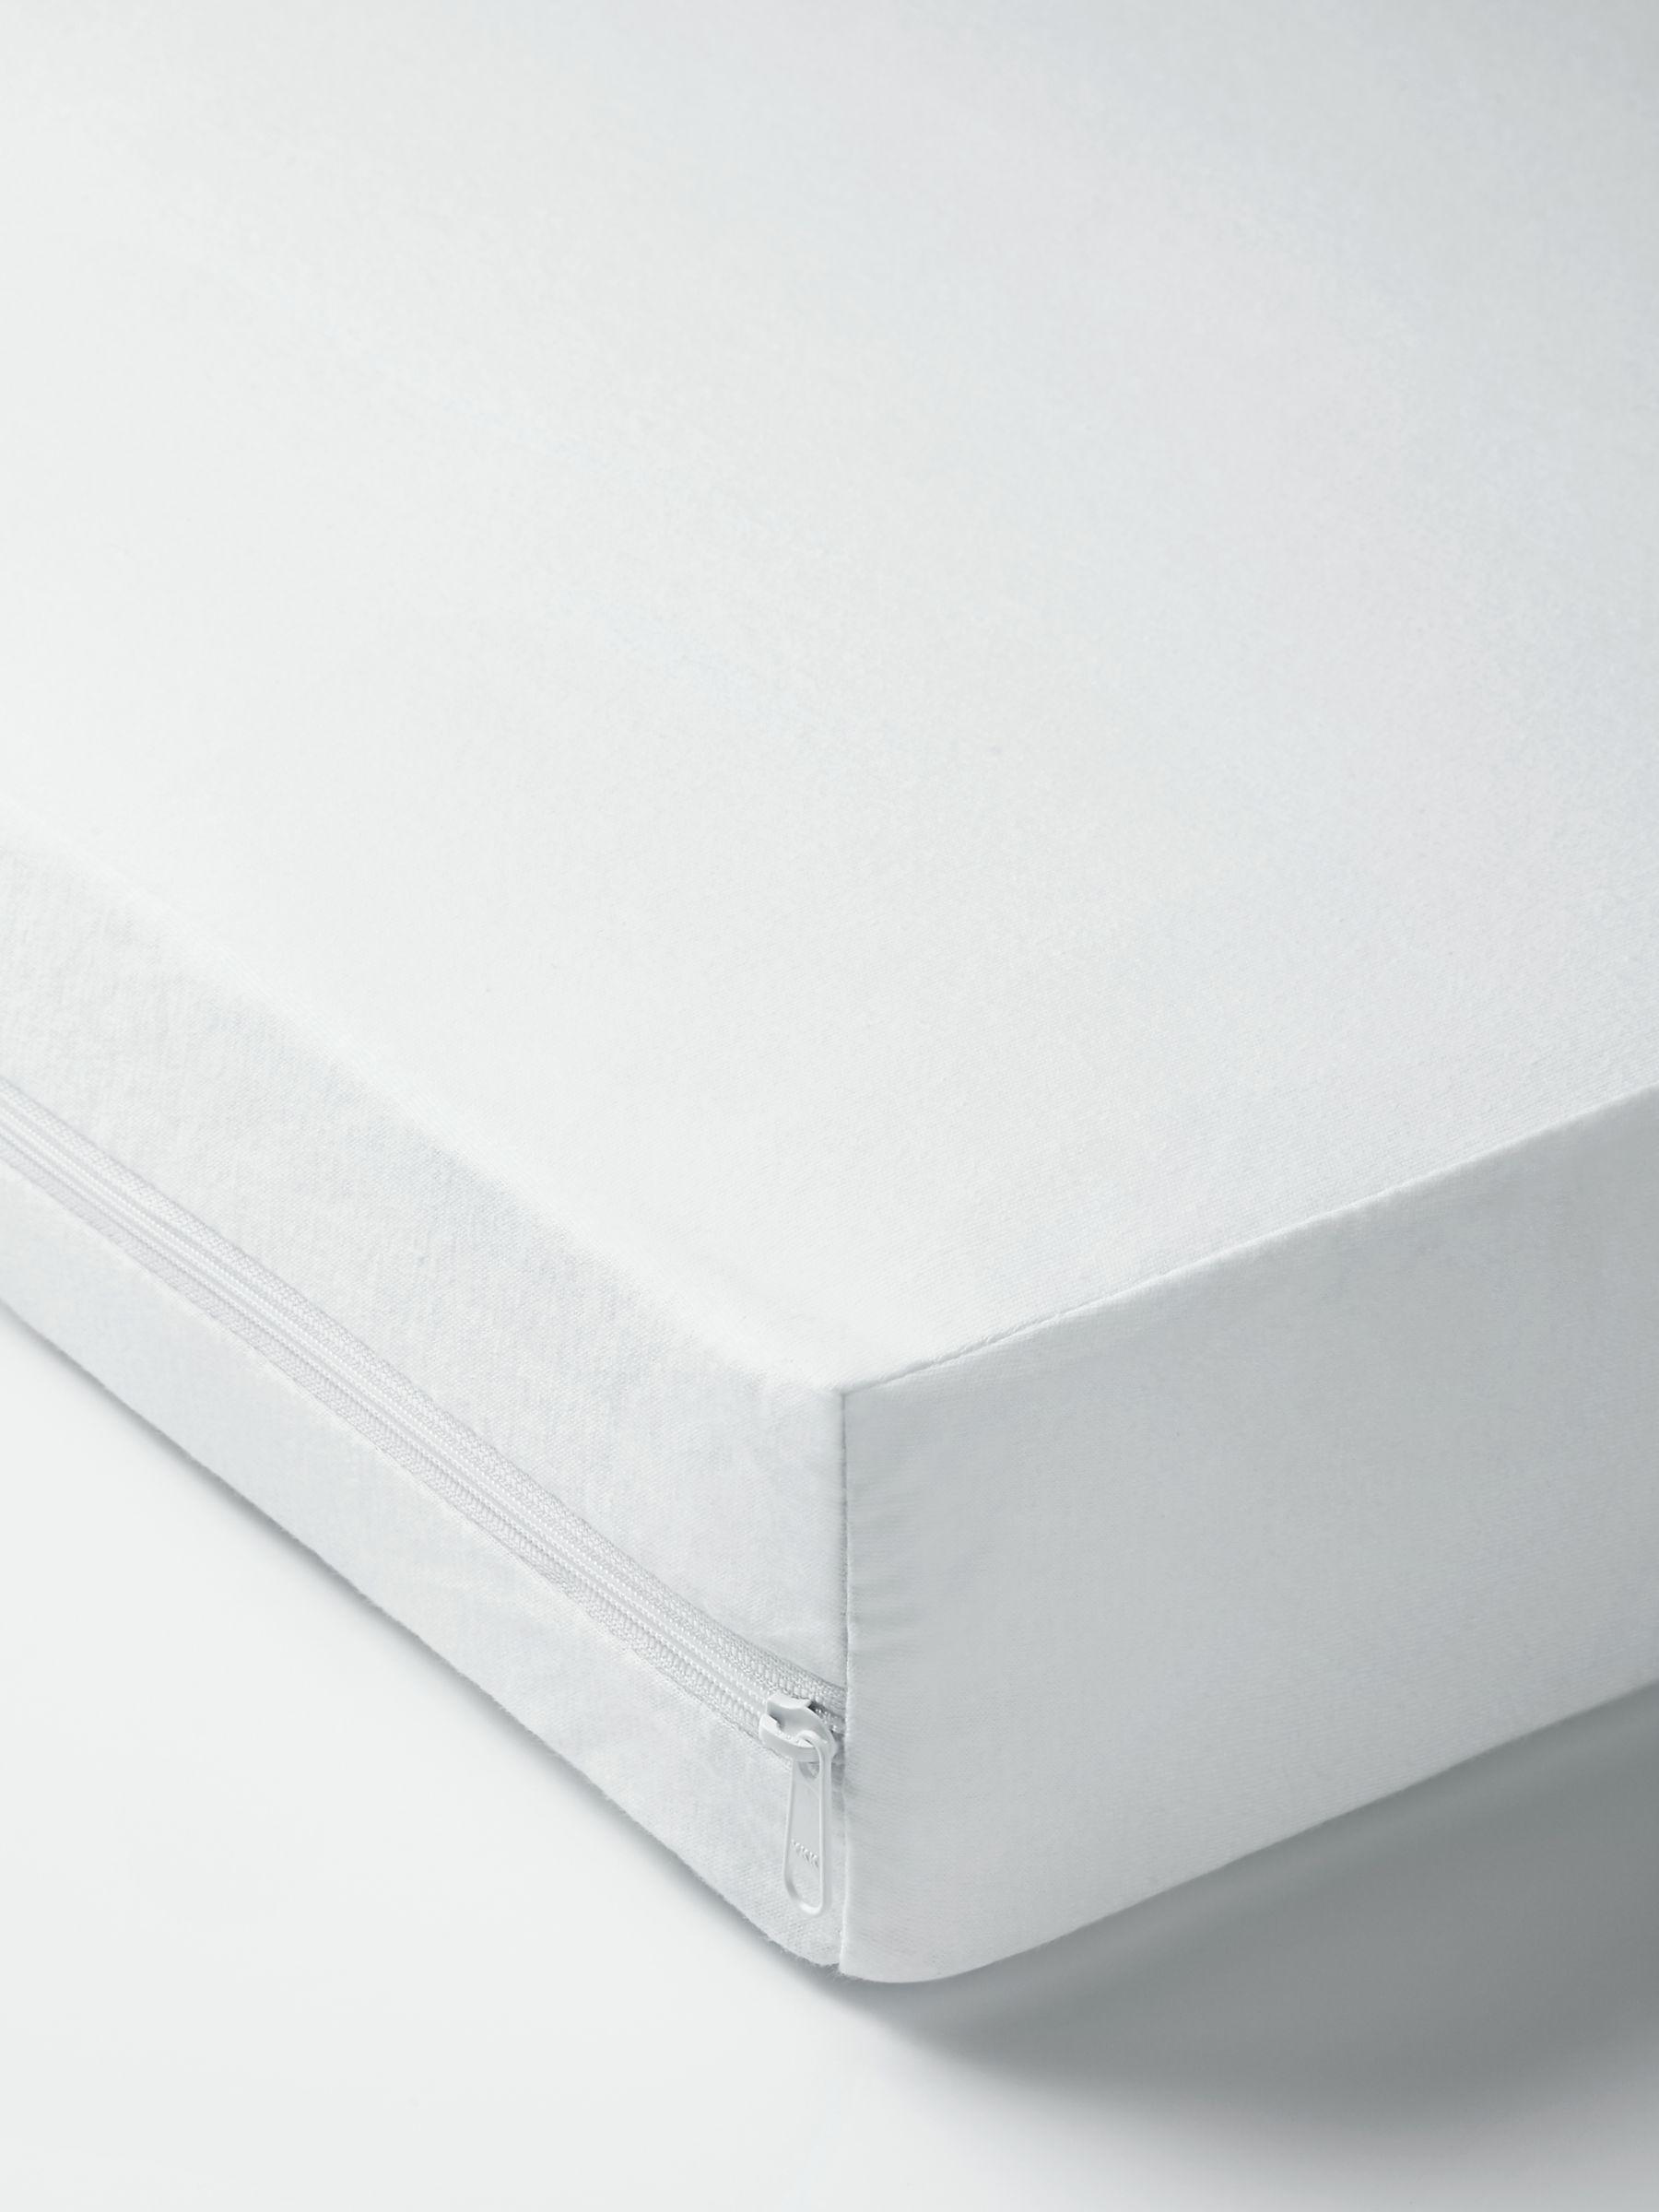 John Lewis & Partners Micro-Fresh Anti Allergy Waterproof Cot Mattress Protector